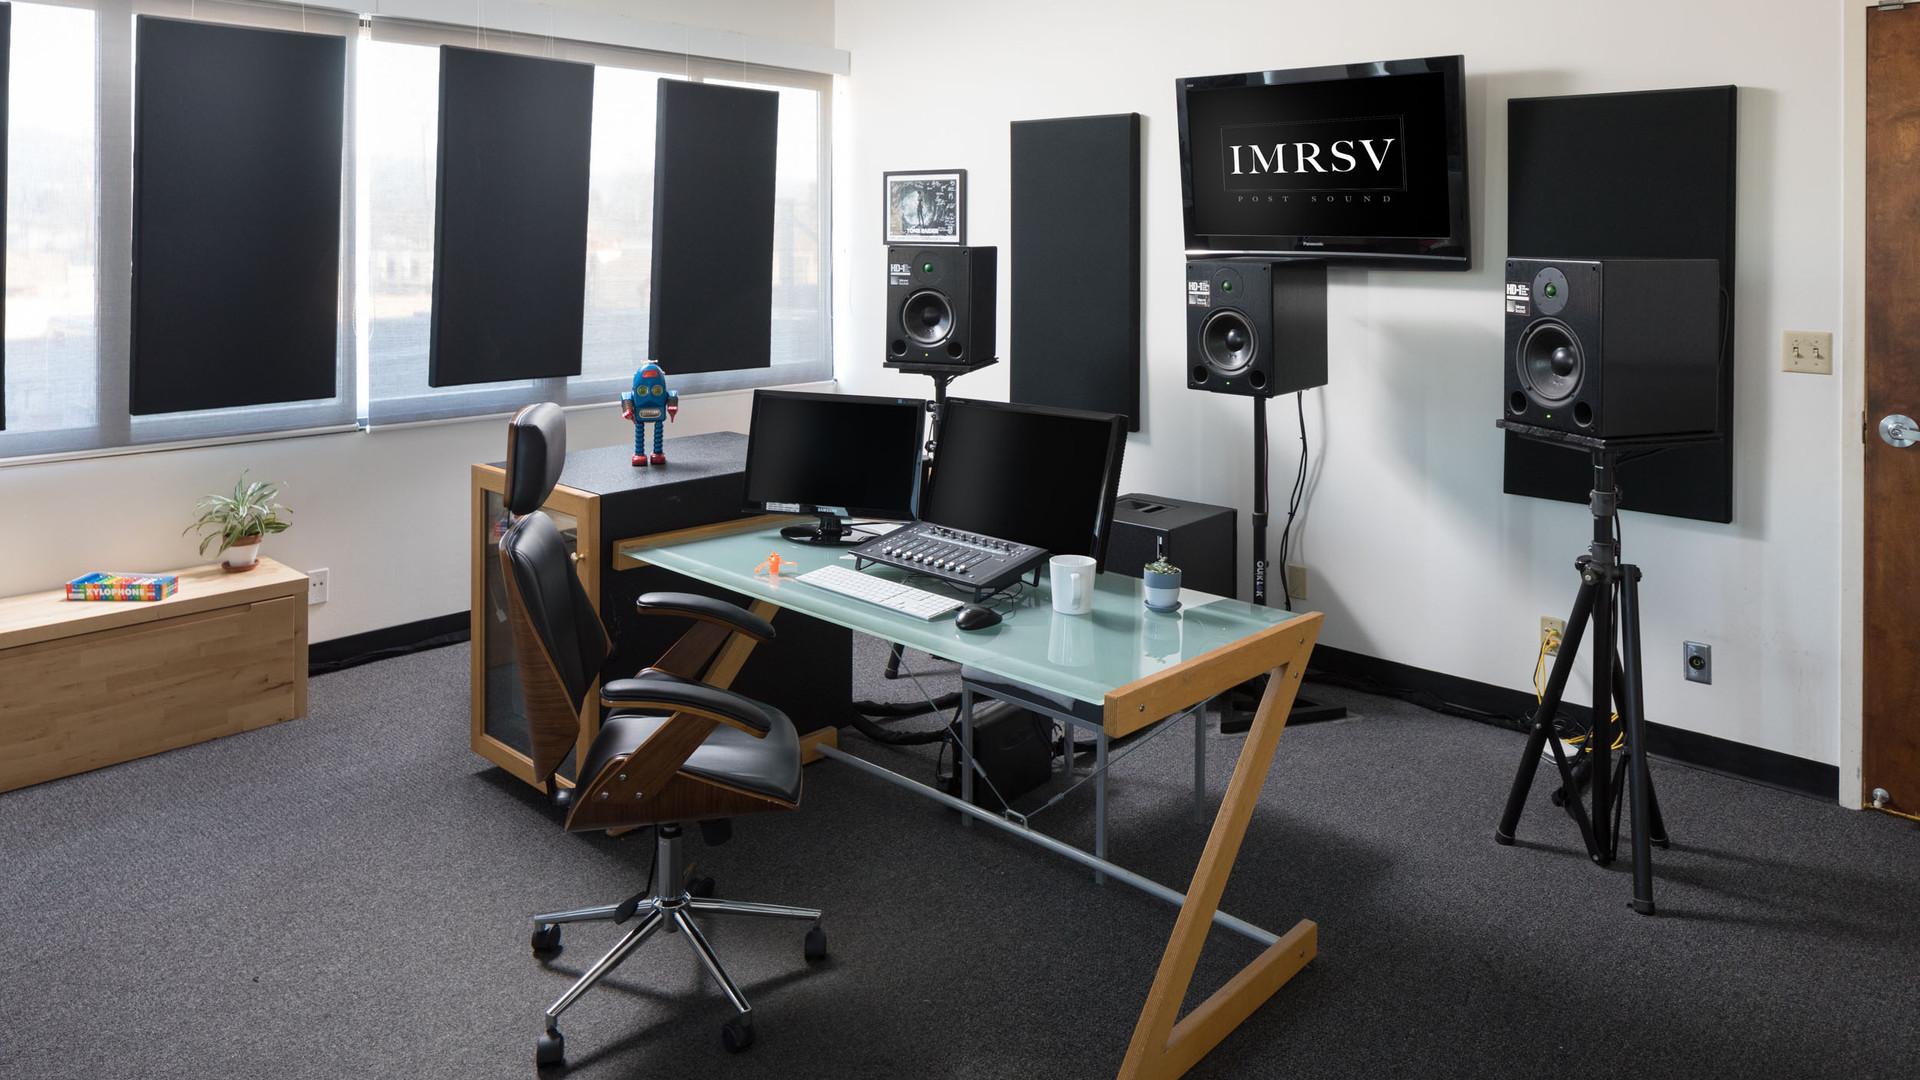 IMSRV Sound